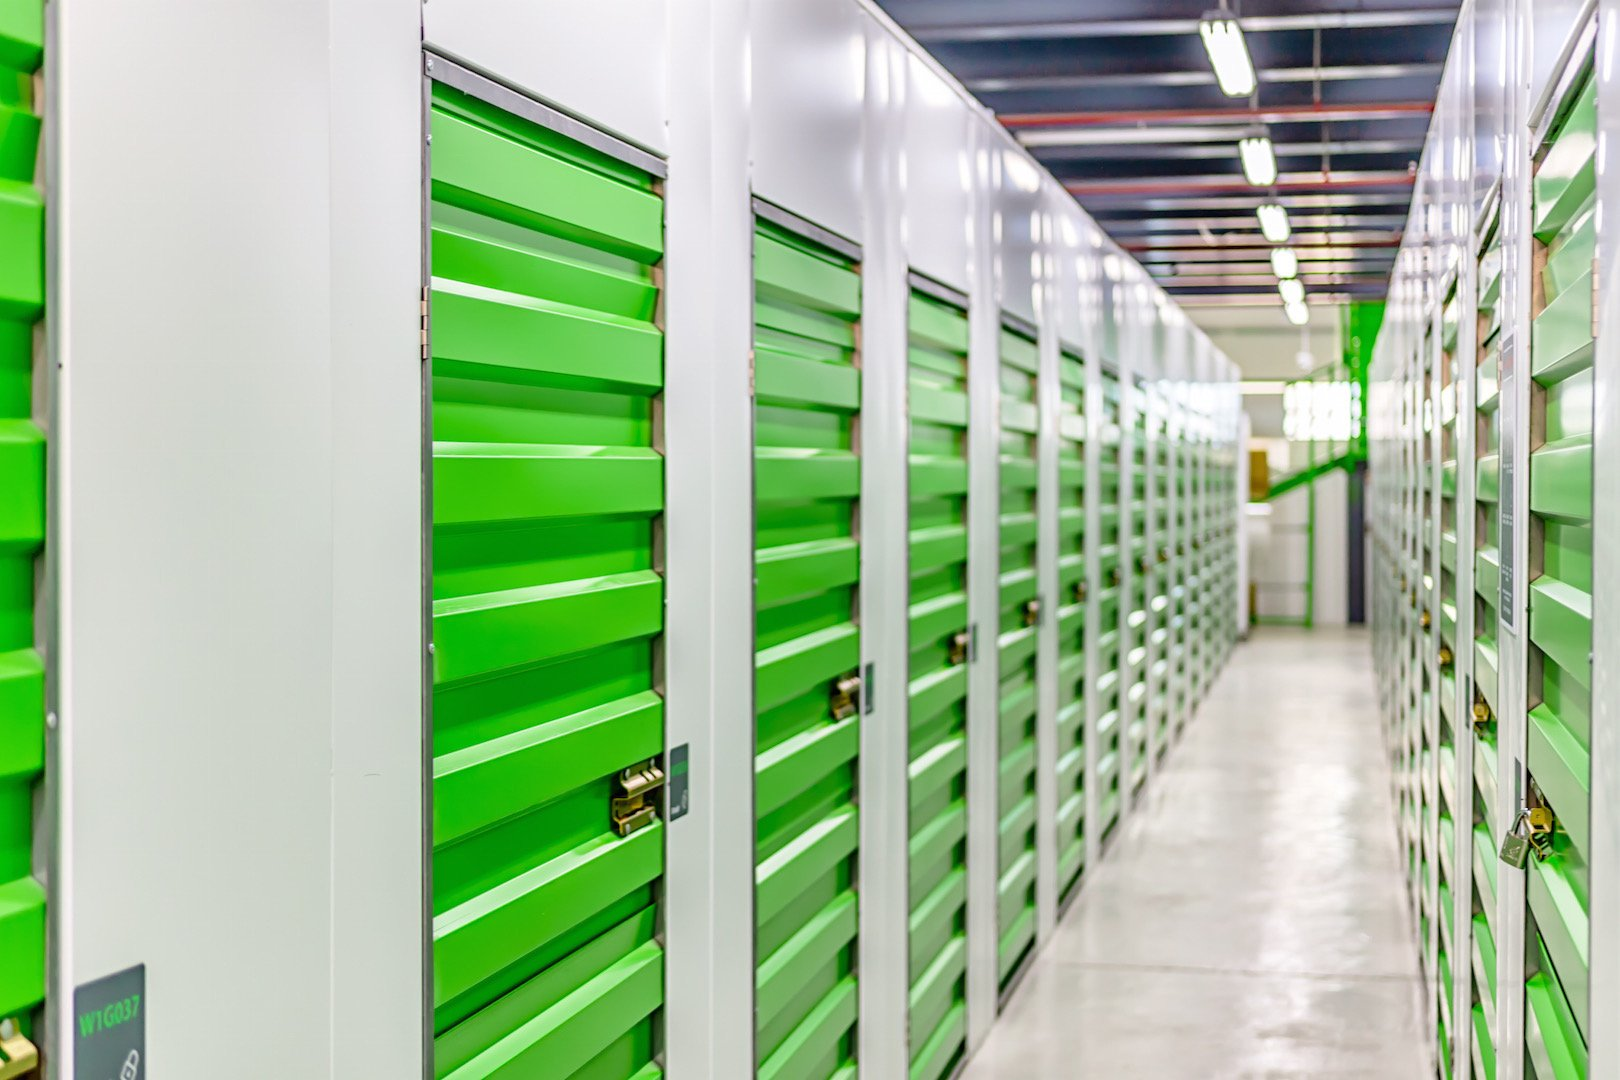 25-percent-discount-25-sqft-self-storage